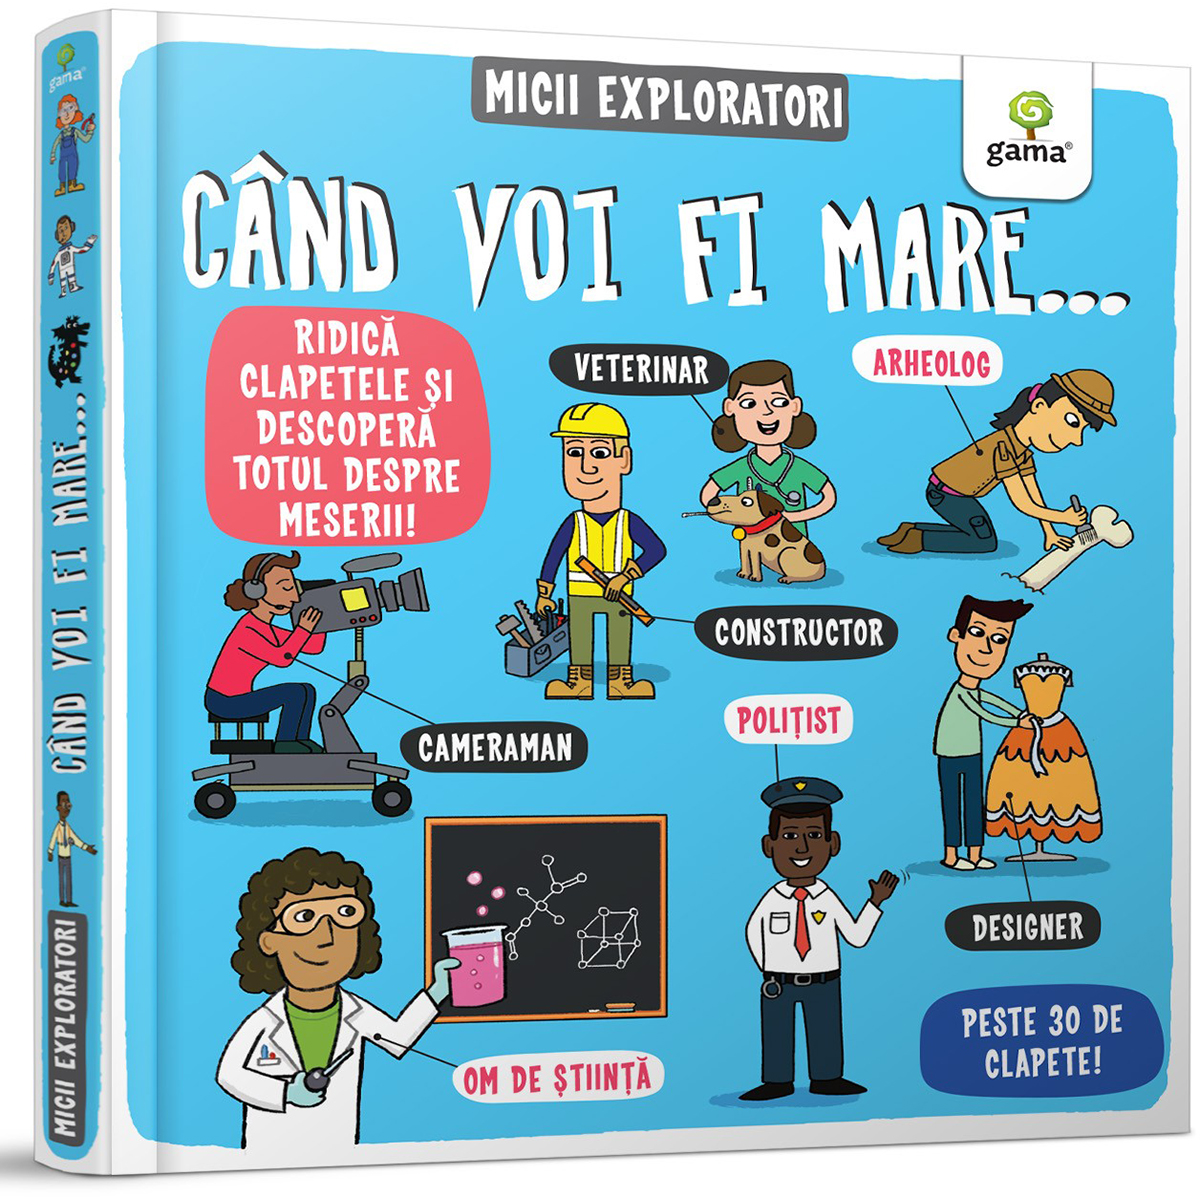 Carte Editura Gama, Micii exploratori, Cand voi fi mare